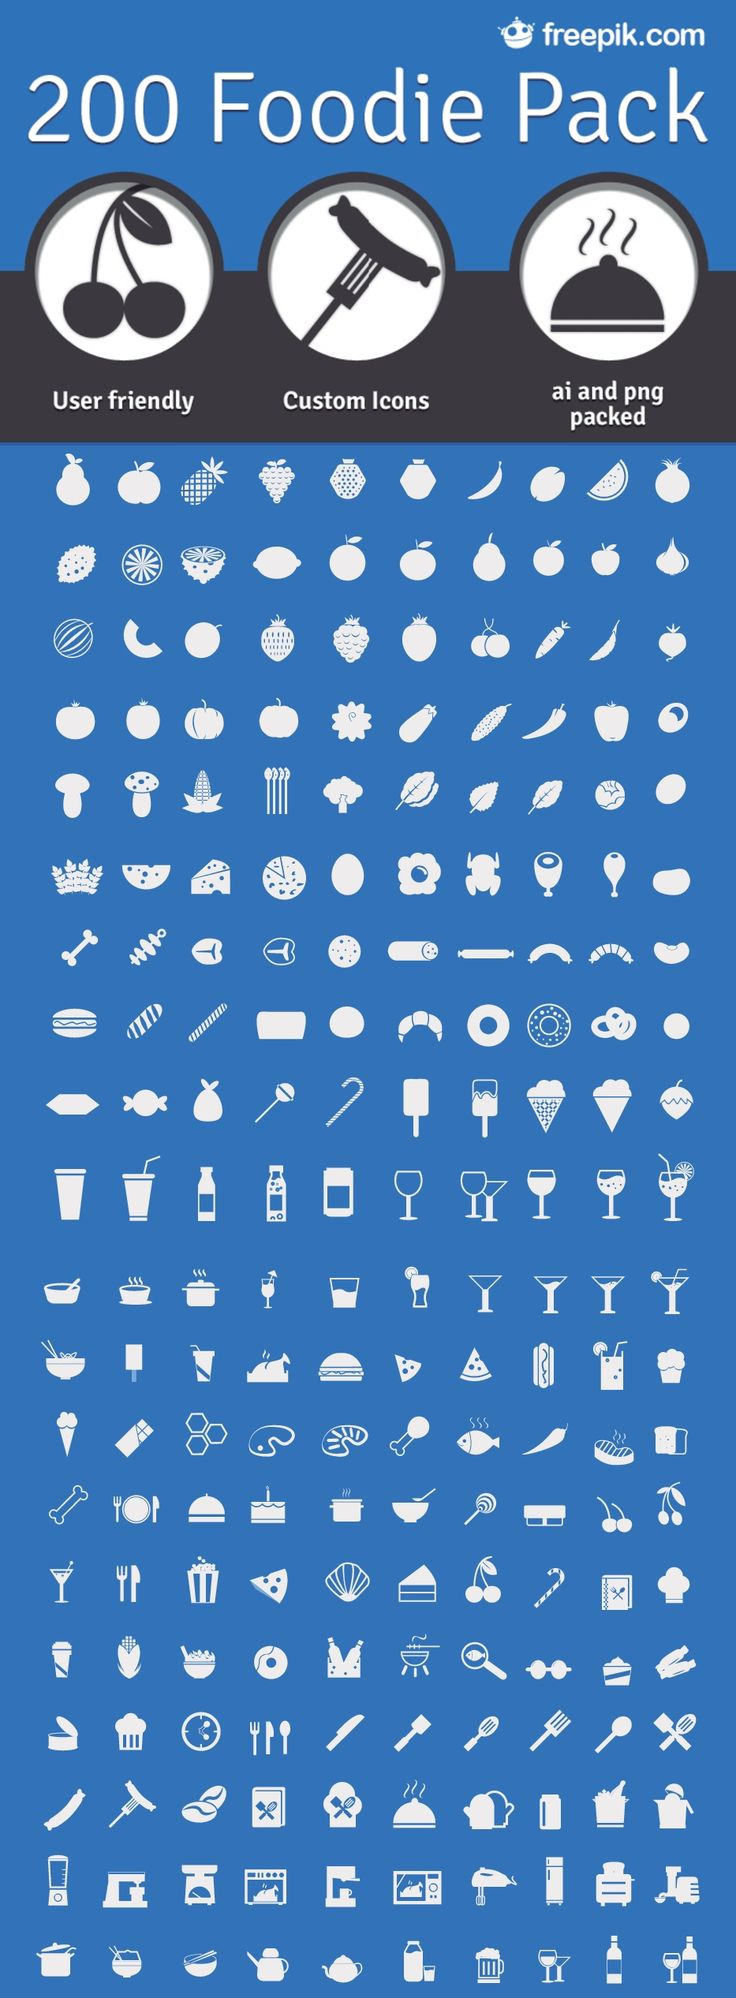 200 Free Food Icons